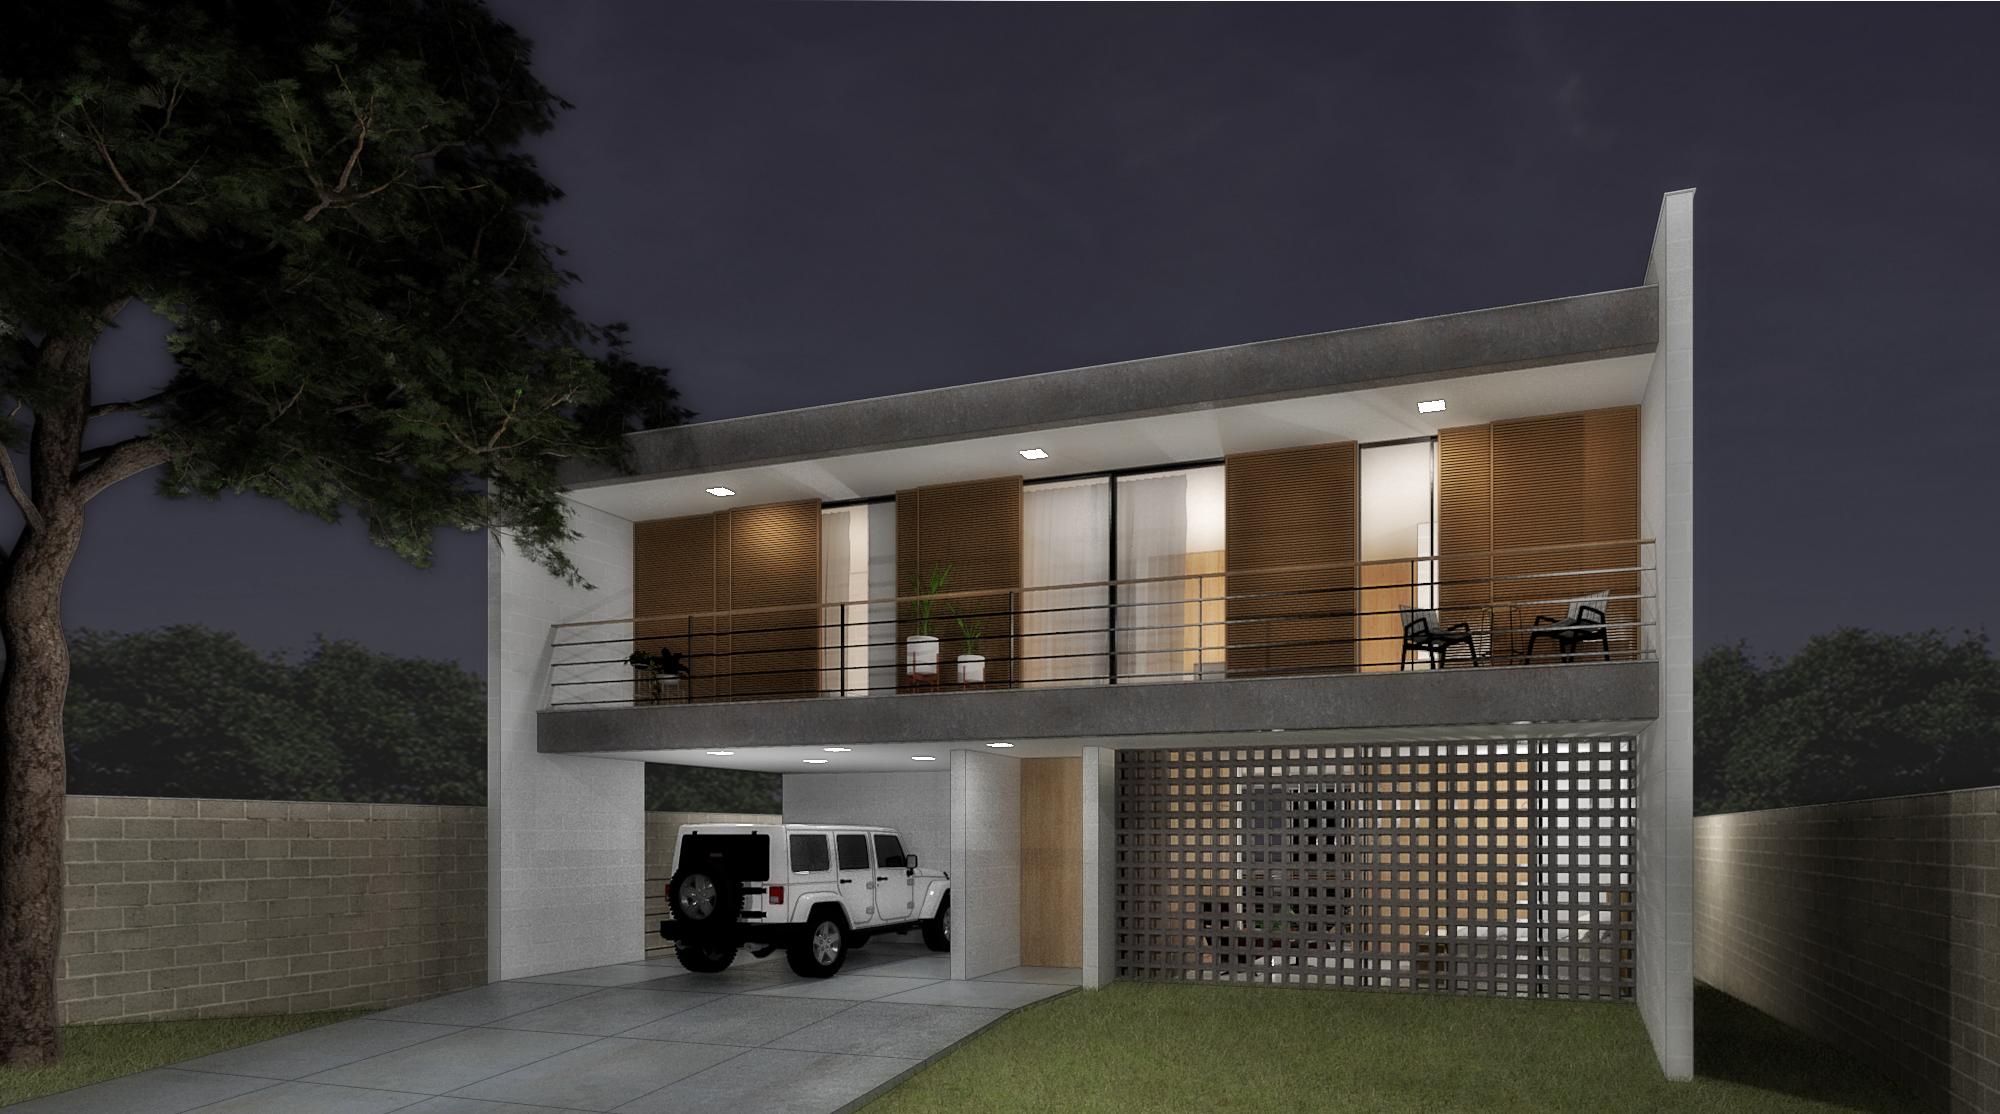 residencia-tn-daniel-carvalho-arquiteto-3